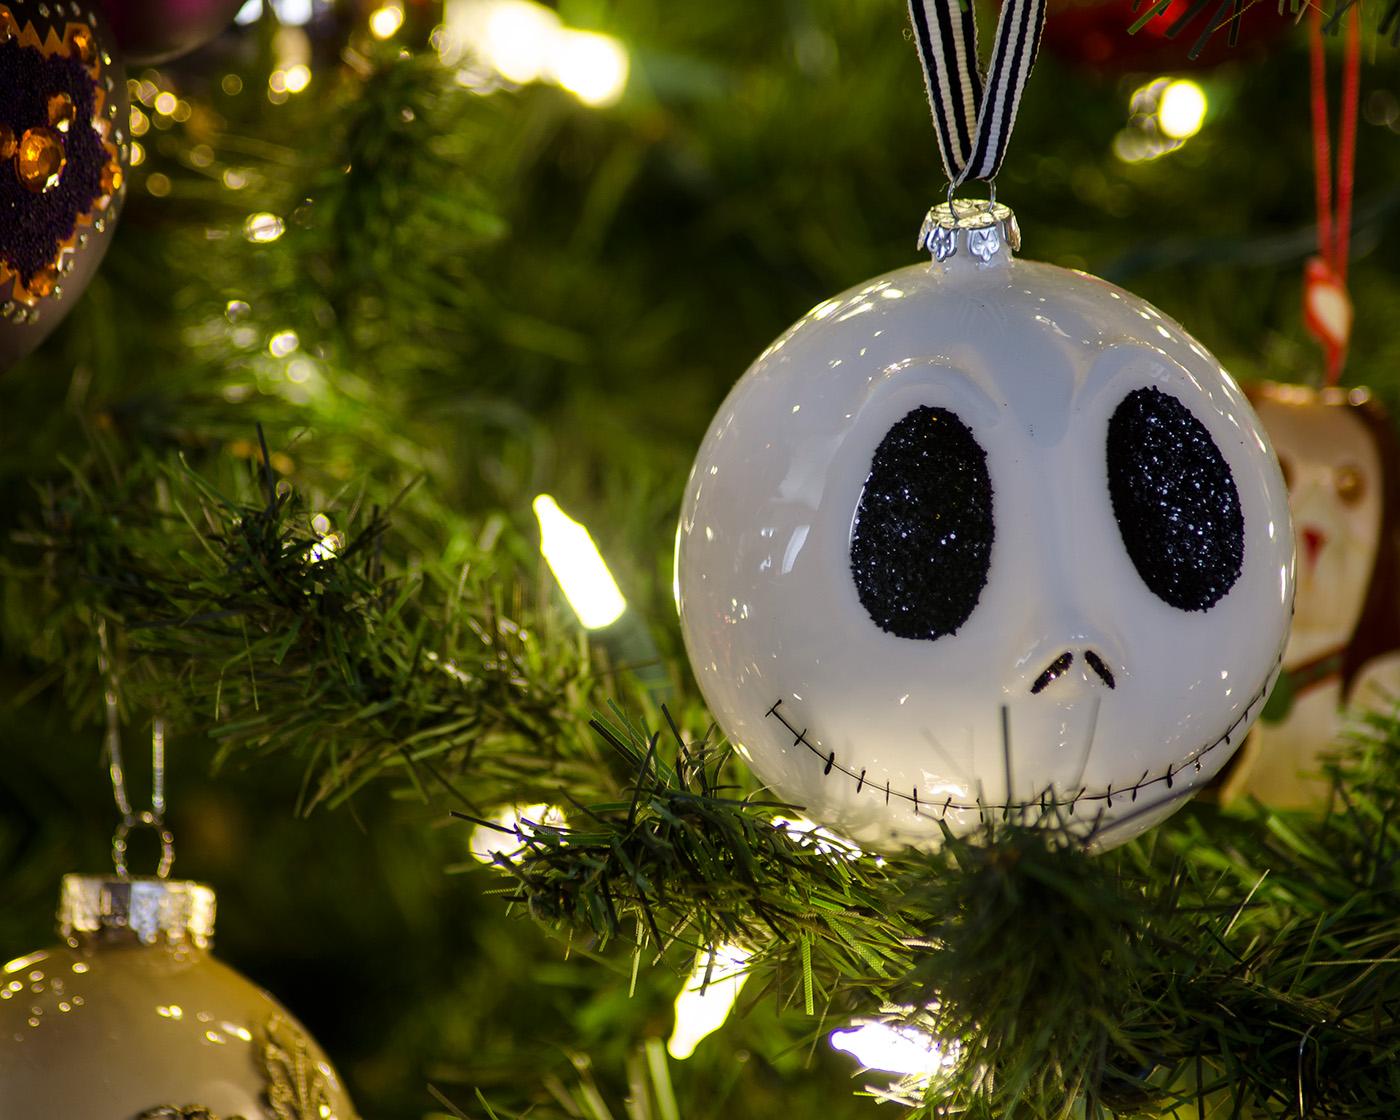 Los adornos navide os representan un objeto esencial del for Elaboracion de adornos navidenos